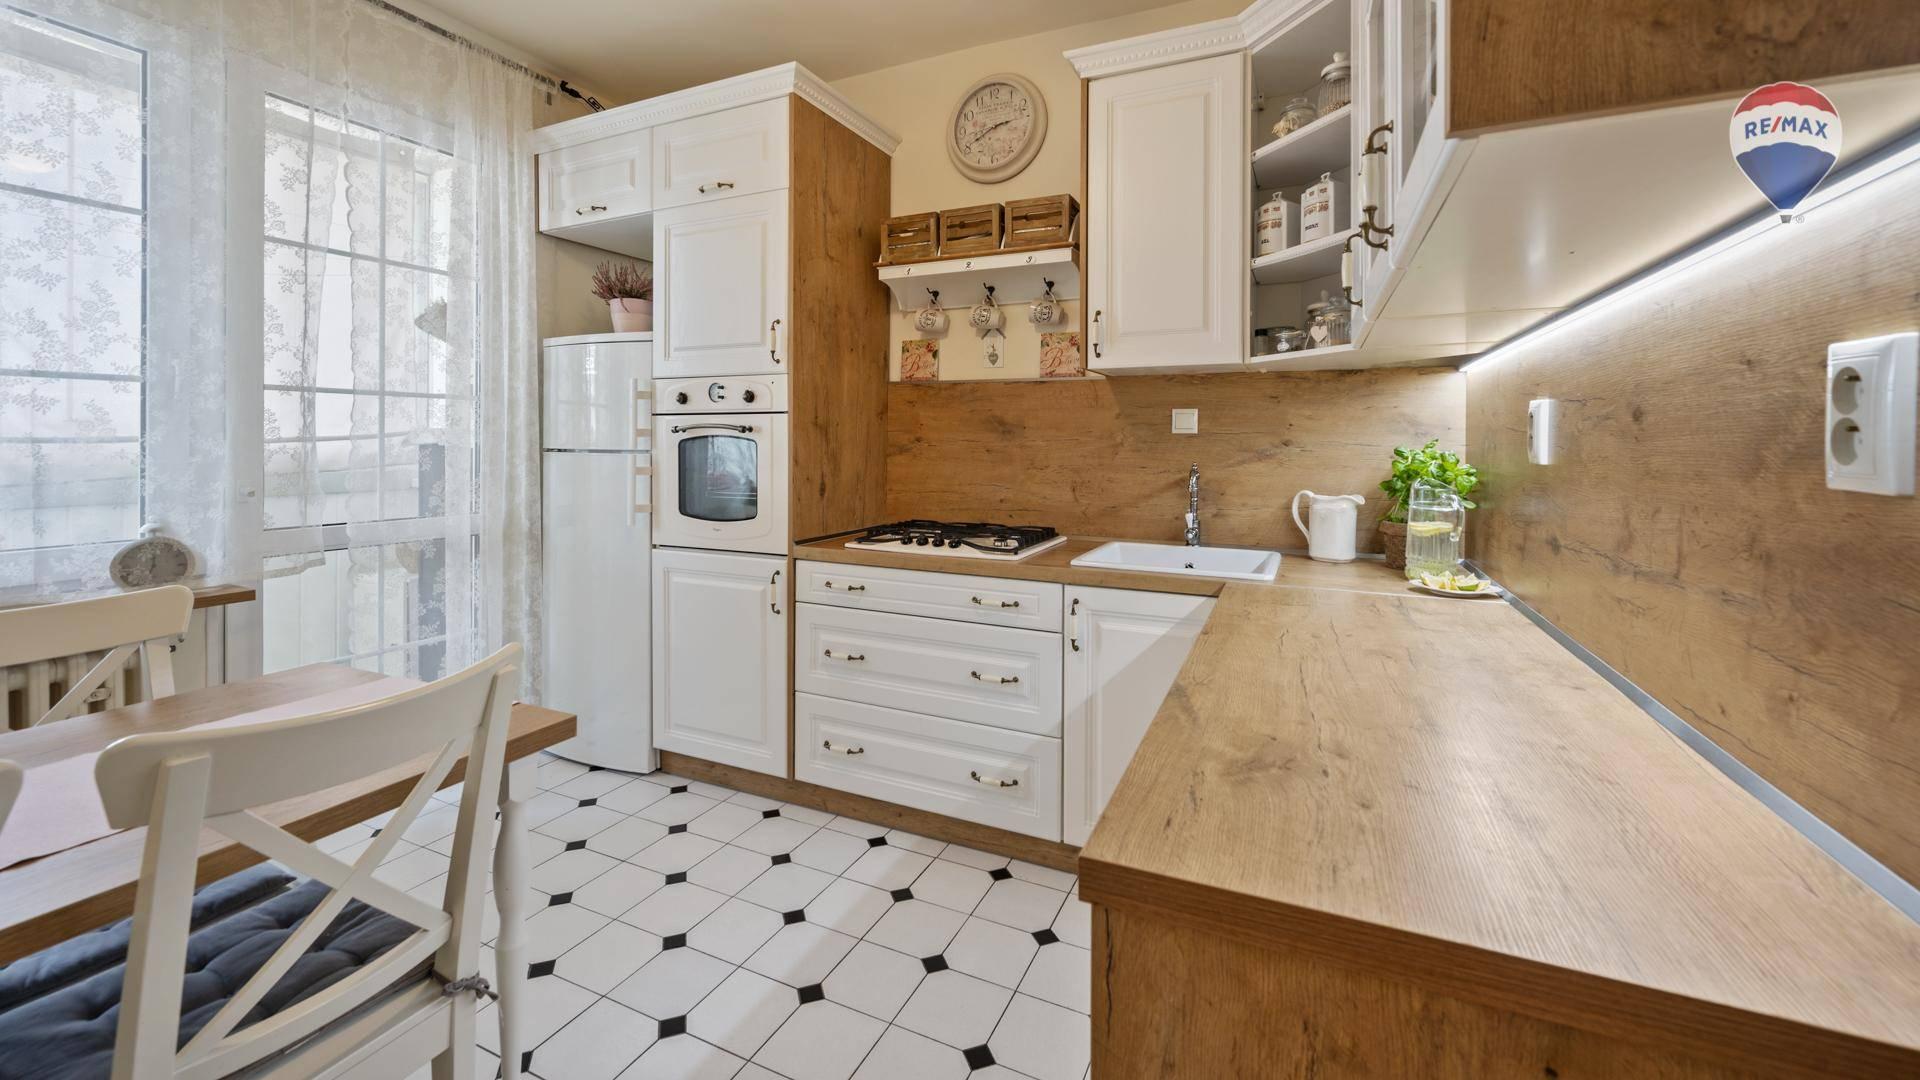 Predaj bytu (3 izbový) 70 m2, Bratislava - Petržalka